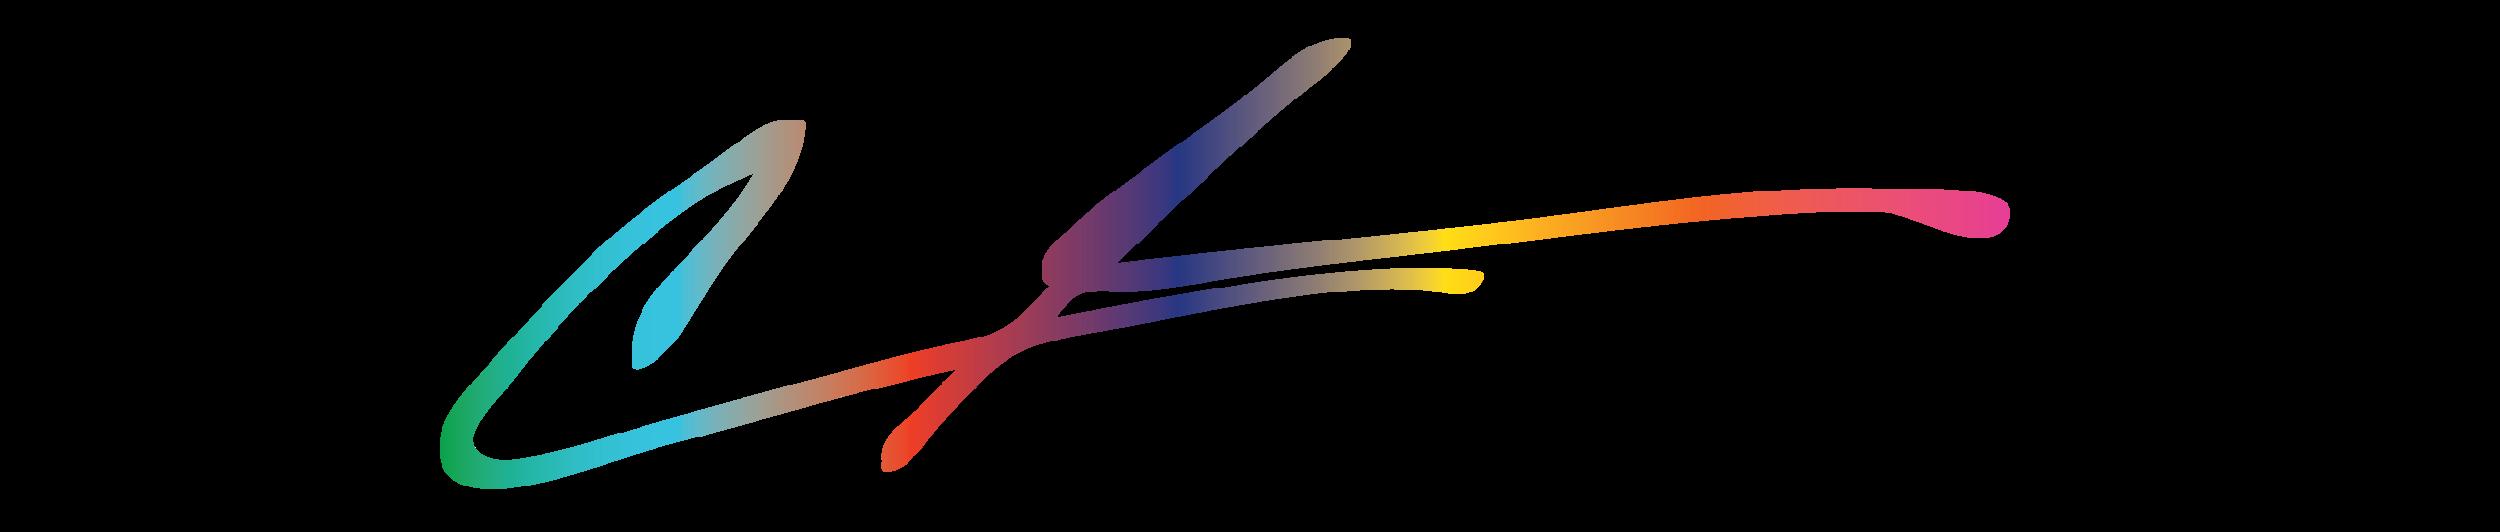 CeeSmithLogo_Print_csmg_logo_final.png